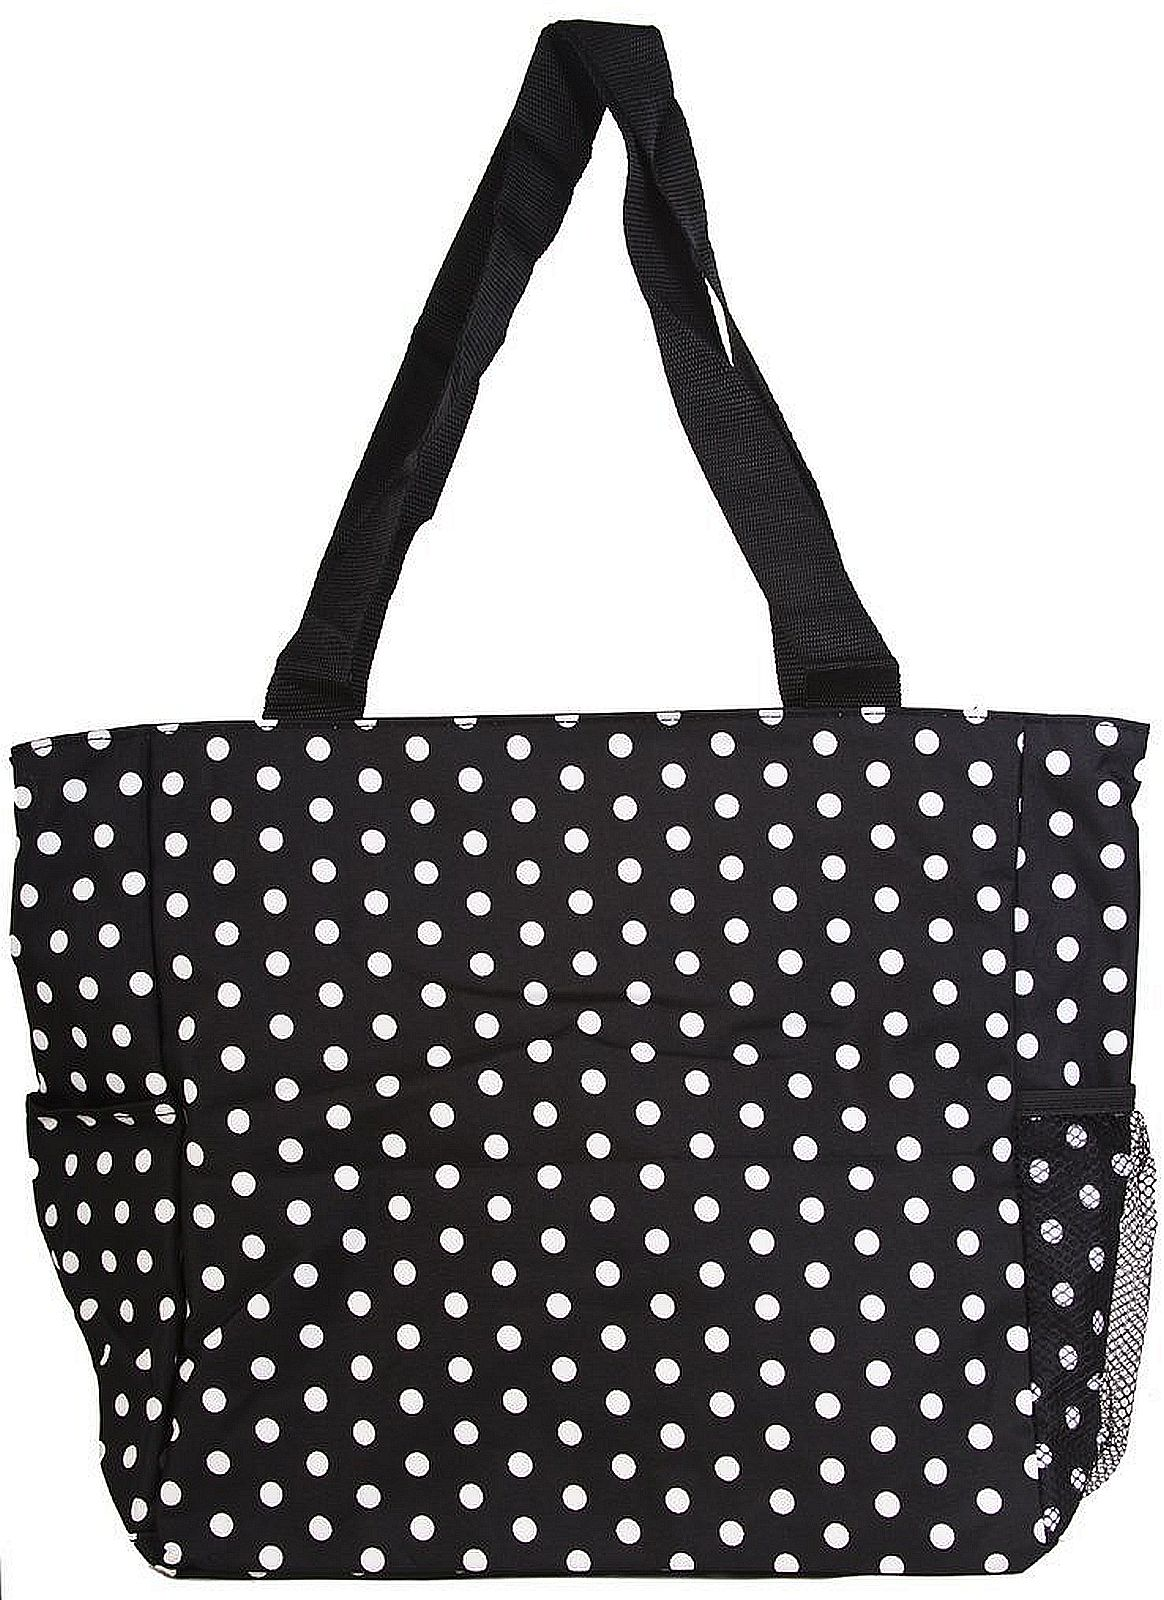 womens large print beach tote shopper weekender school gym travel bag ebay. Black Bedroom Furniture Sets. Home Design Ideas